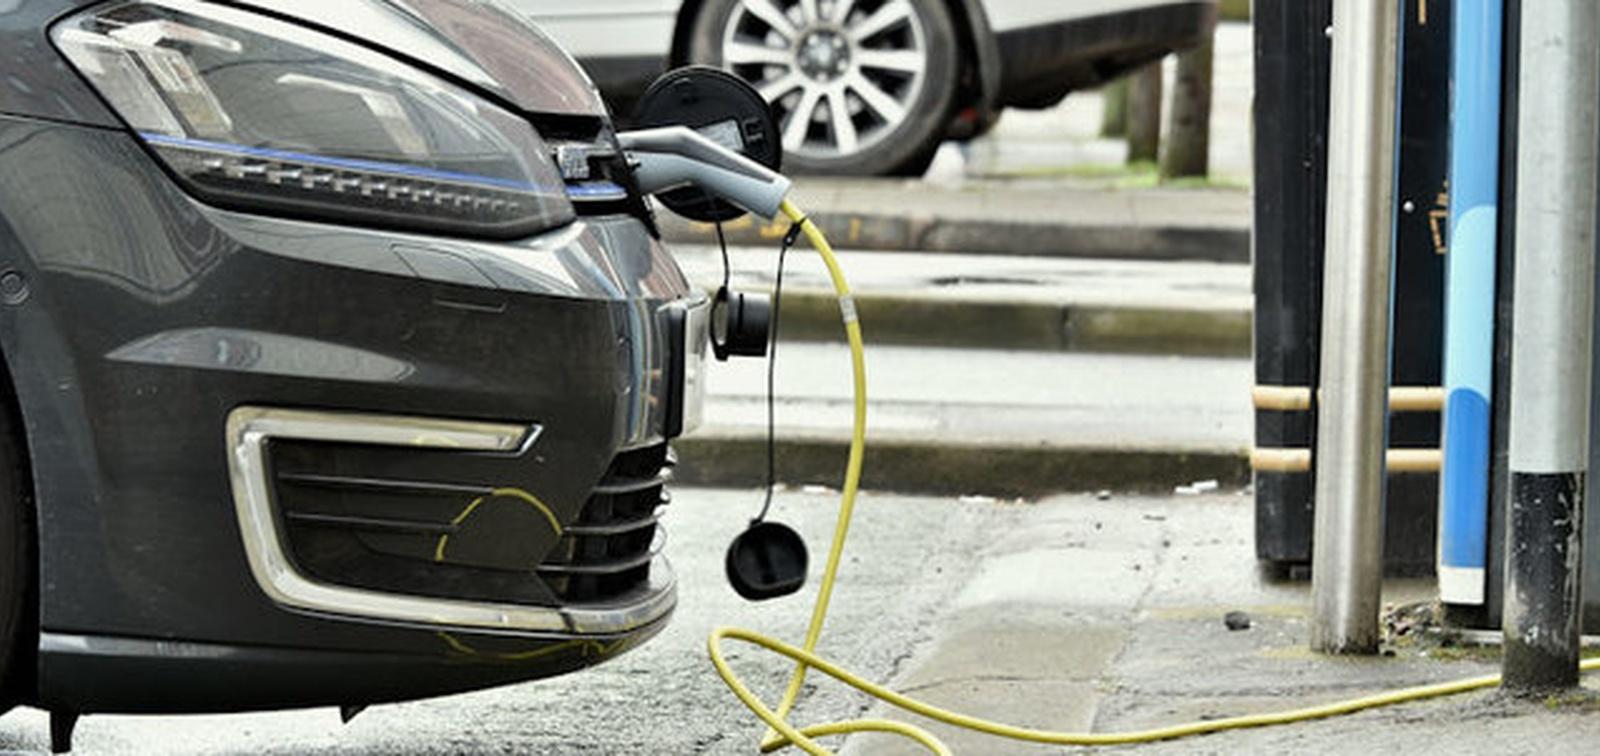 Xcel preps new EV programs to address 'suboptimal' charging incentives in Minnesota